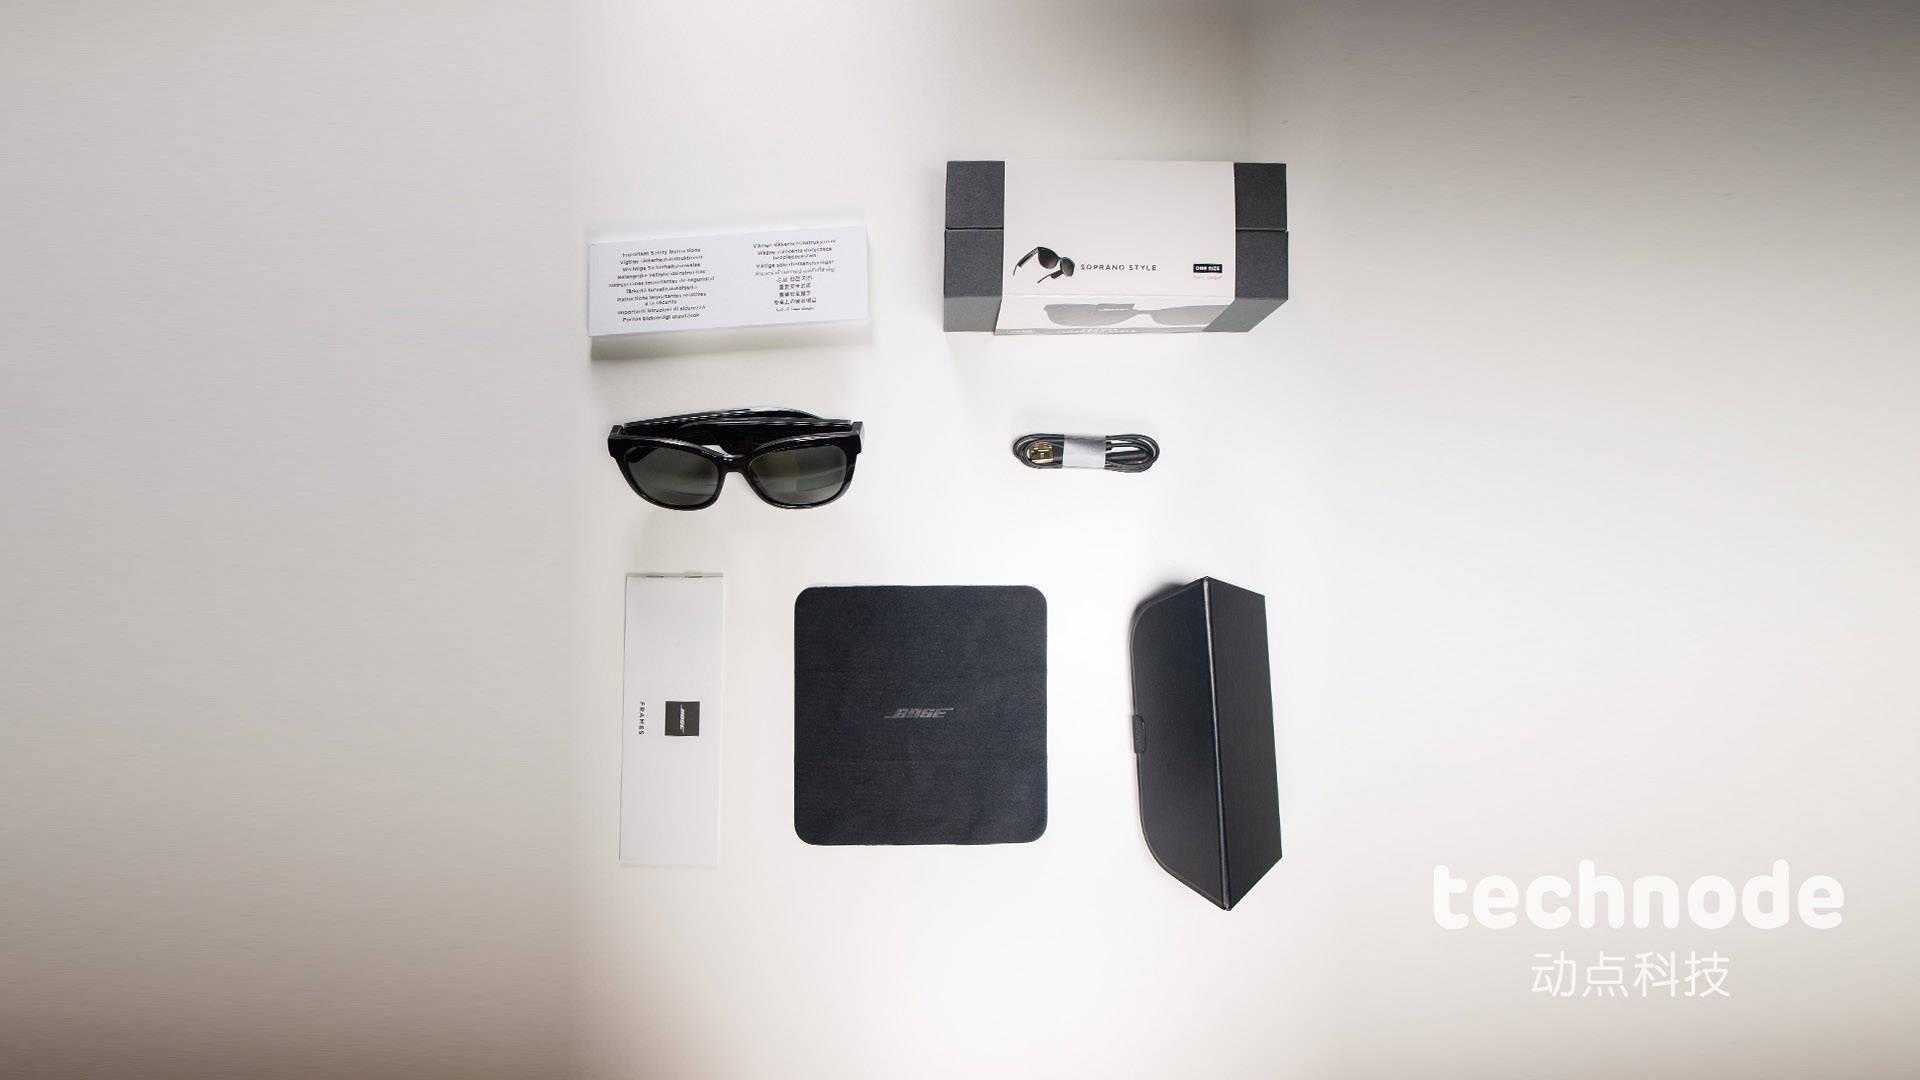 Bose 智能音频眼镜猫眼款评测:好看又好听